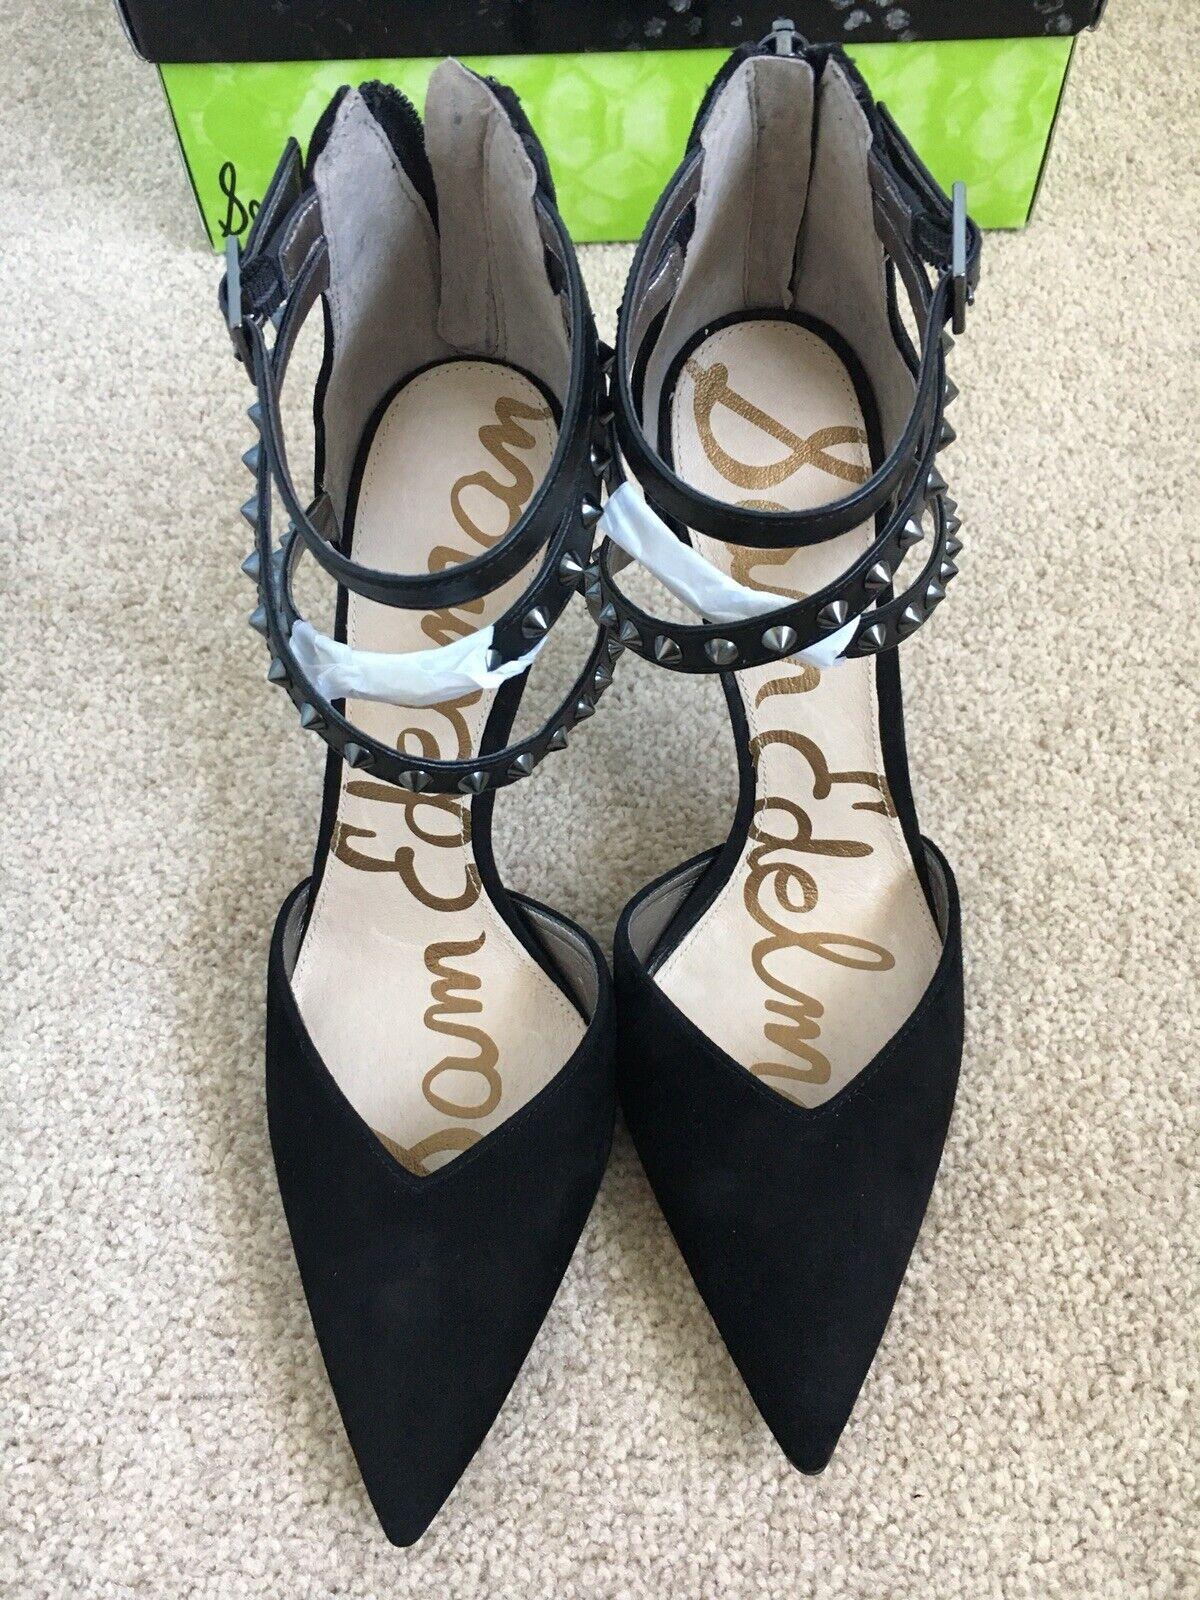 Sam Edelman Darla Studded Strap Heeled Heeled Heeled Black Suede shoes Size US6 (fit UK4) BNIB 277953